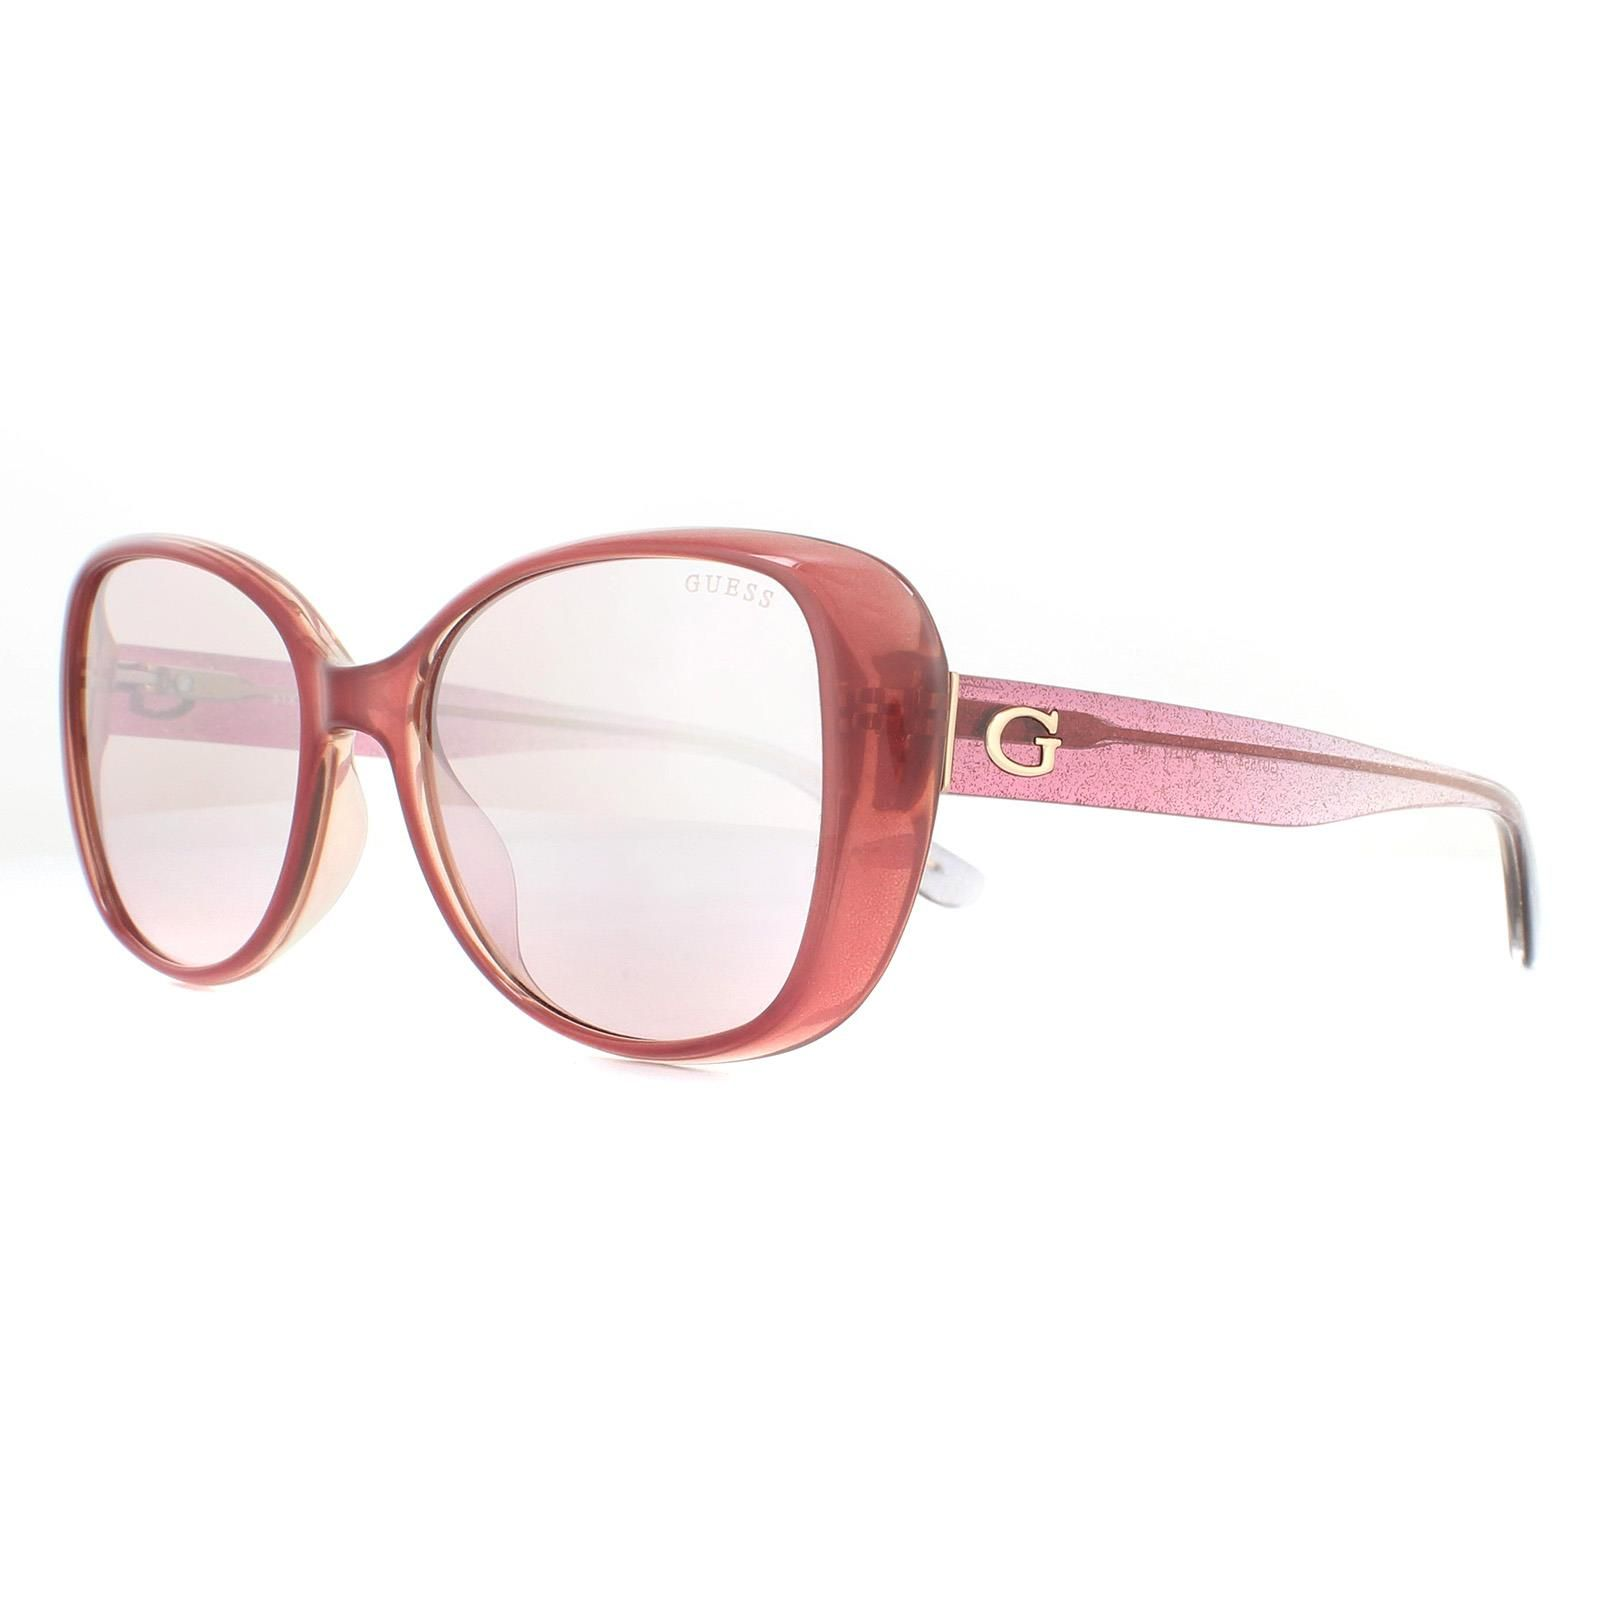 Guess Sunglasses GU7554 74F Pink Pink Brown Gradient